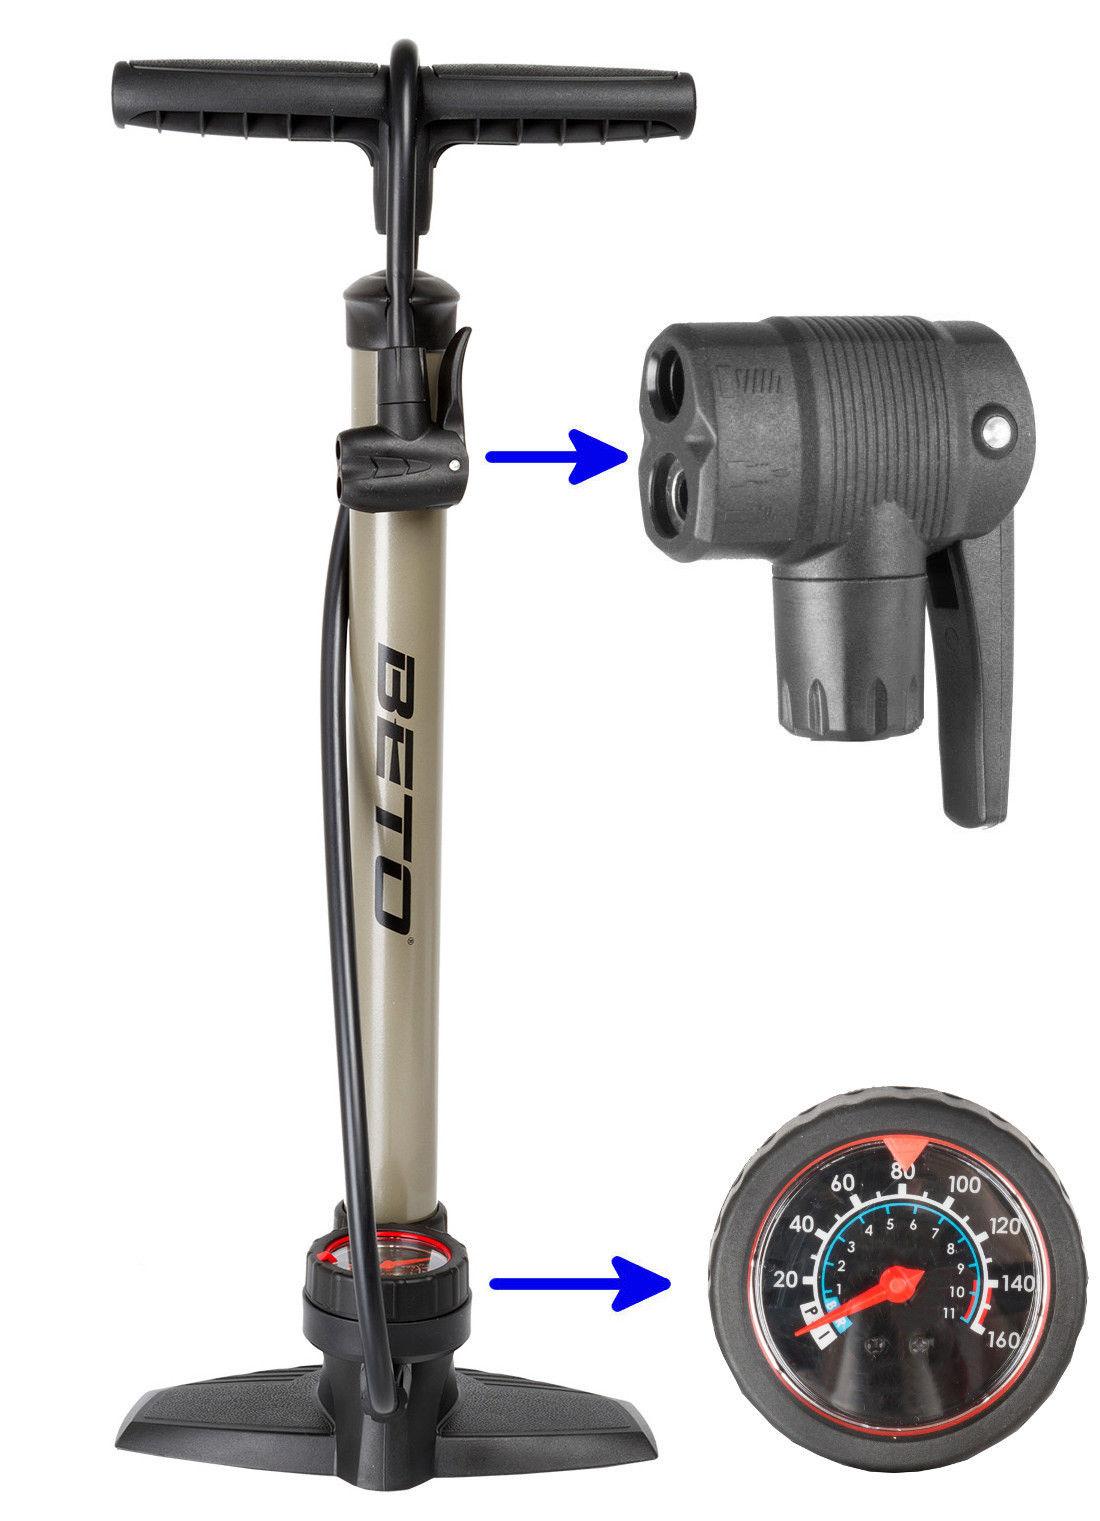 BETO Standpumpe mit Manometer bis 11 bar Luftpumpe Fahrradpumpe f. alle Ventile